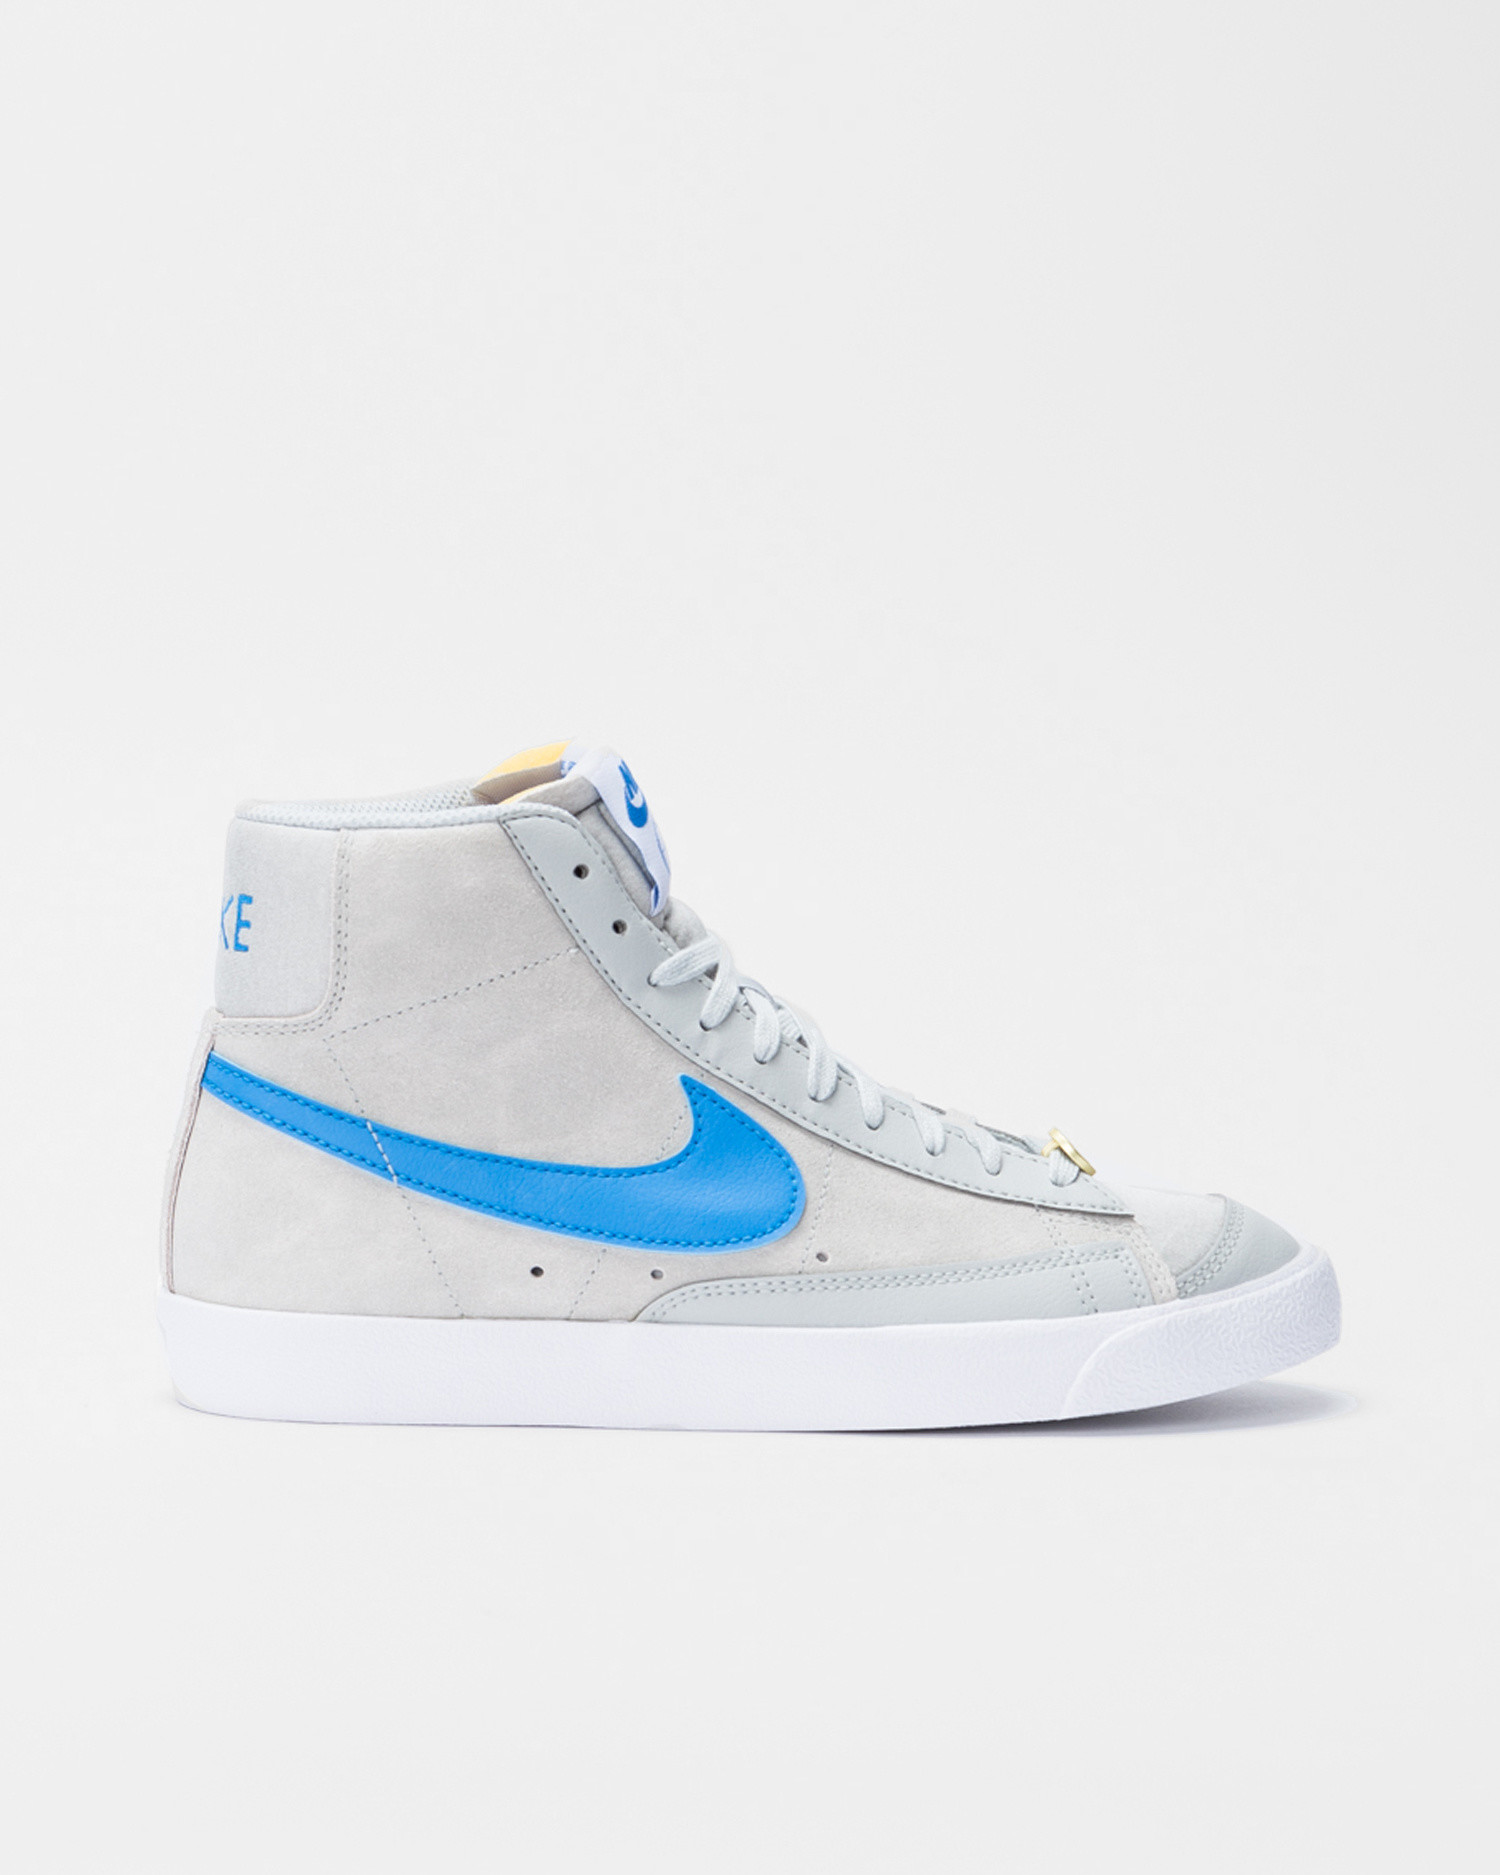 Nike Blazer mid '77 nrg emb Grey fog/lt photo blue-white